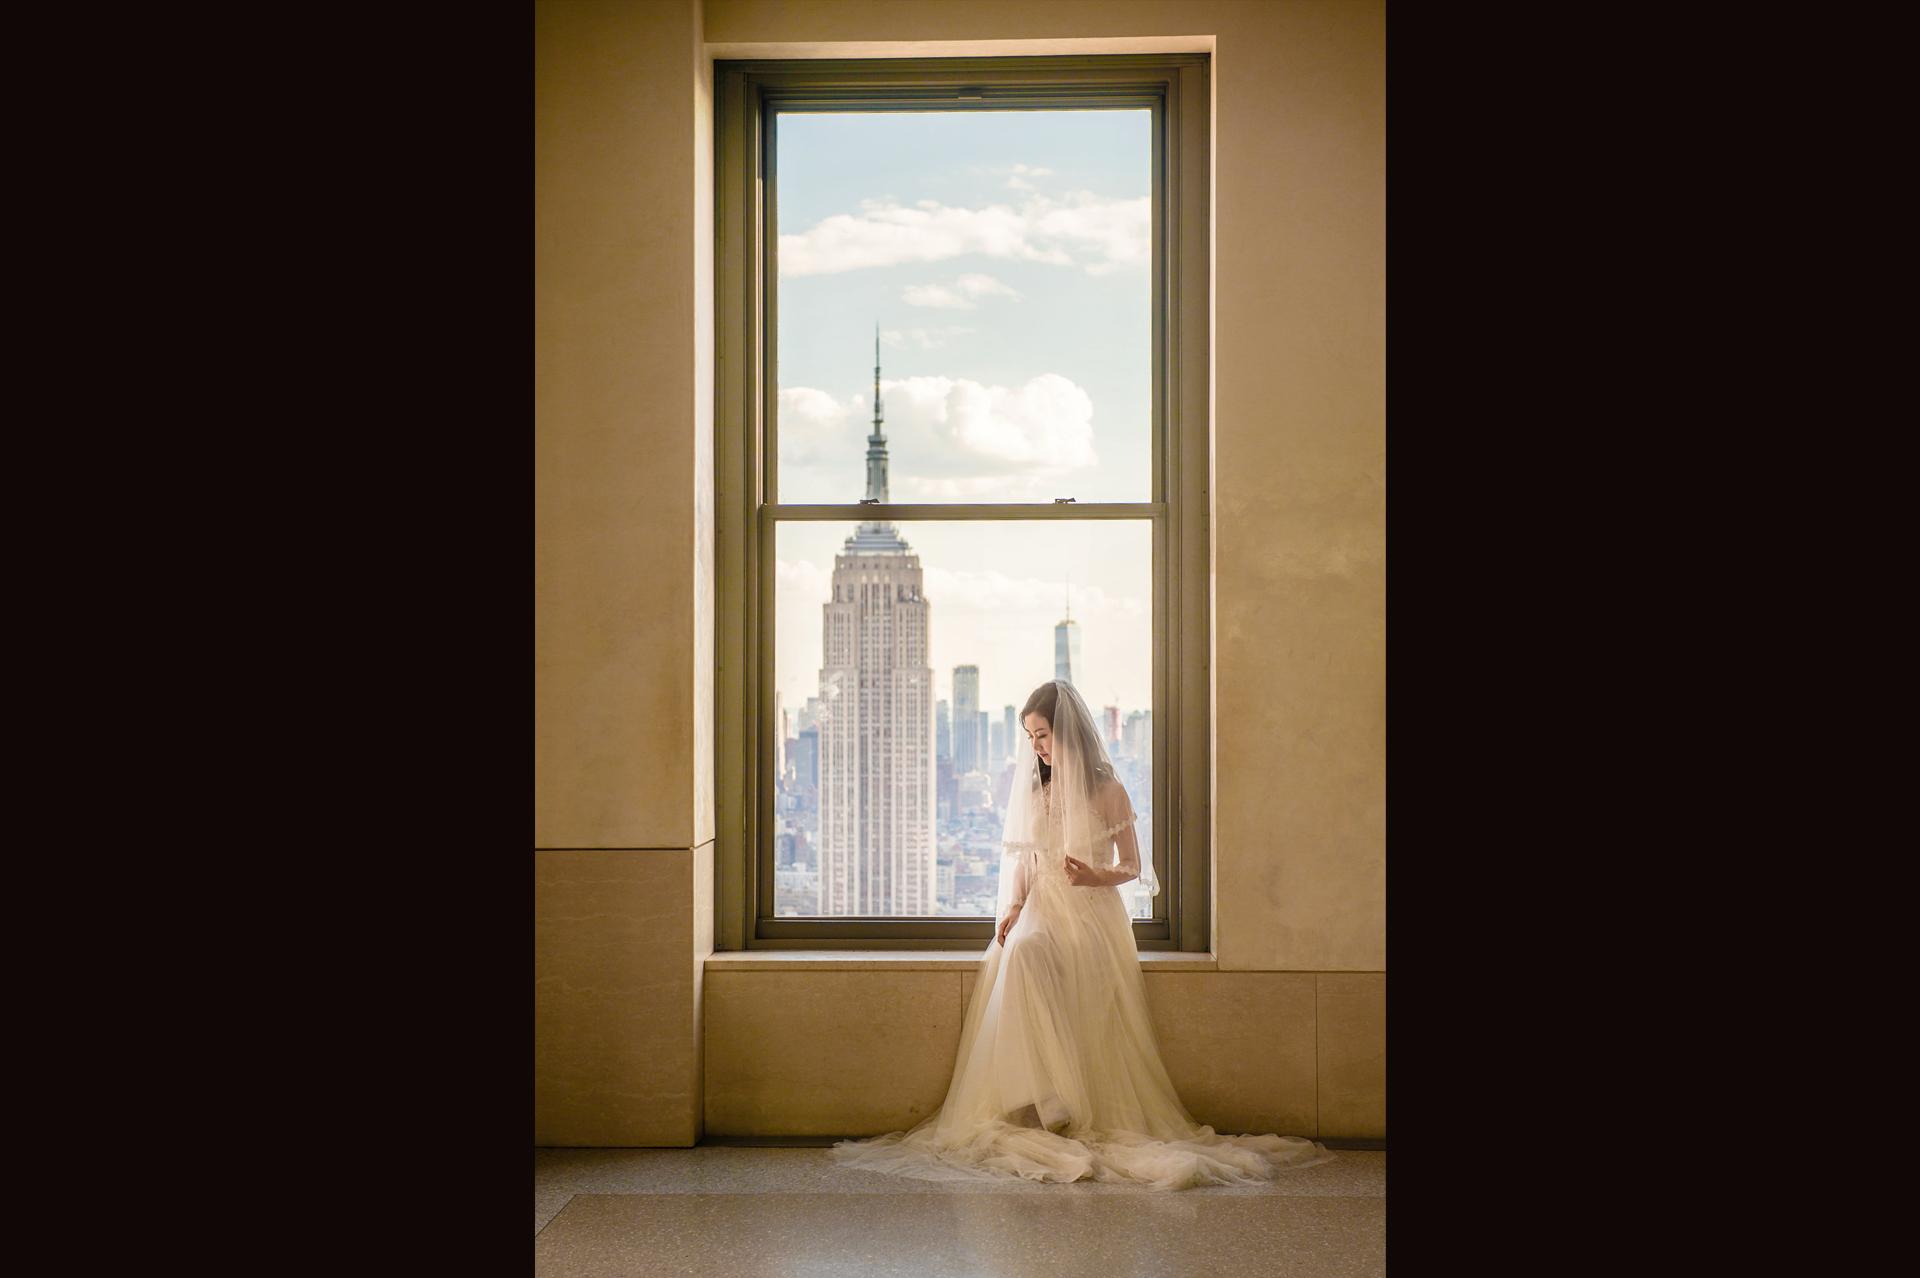 纽约曼哈顿婚纱照  new york top of the rock pre wedding